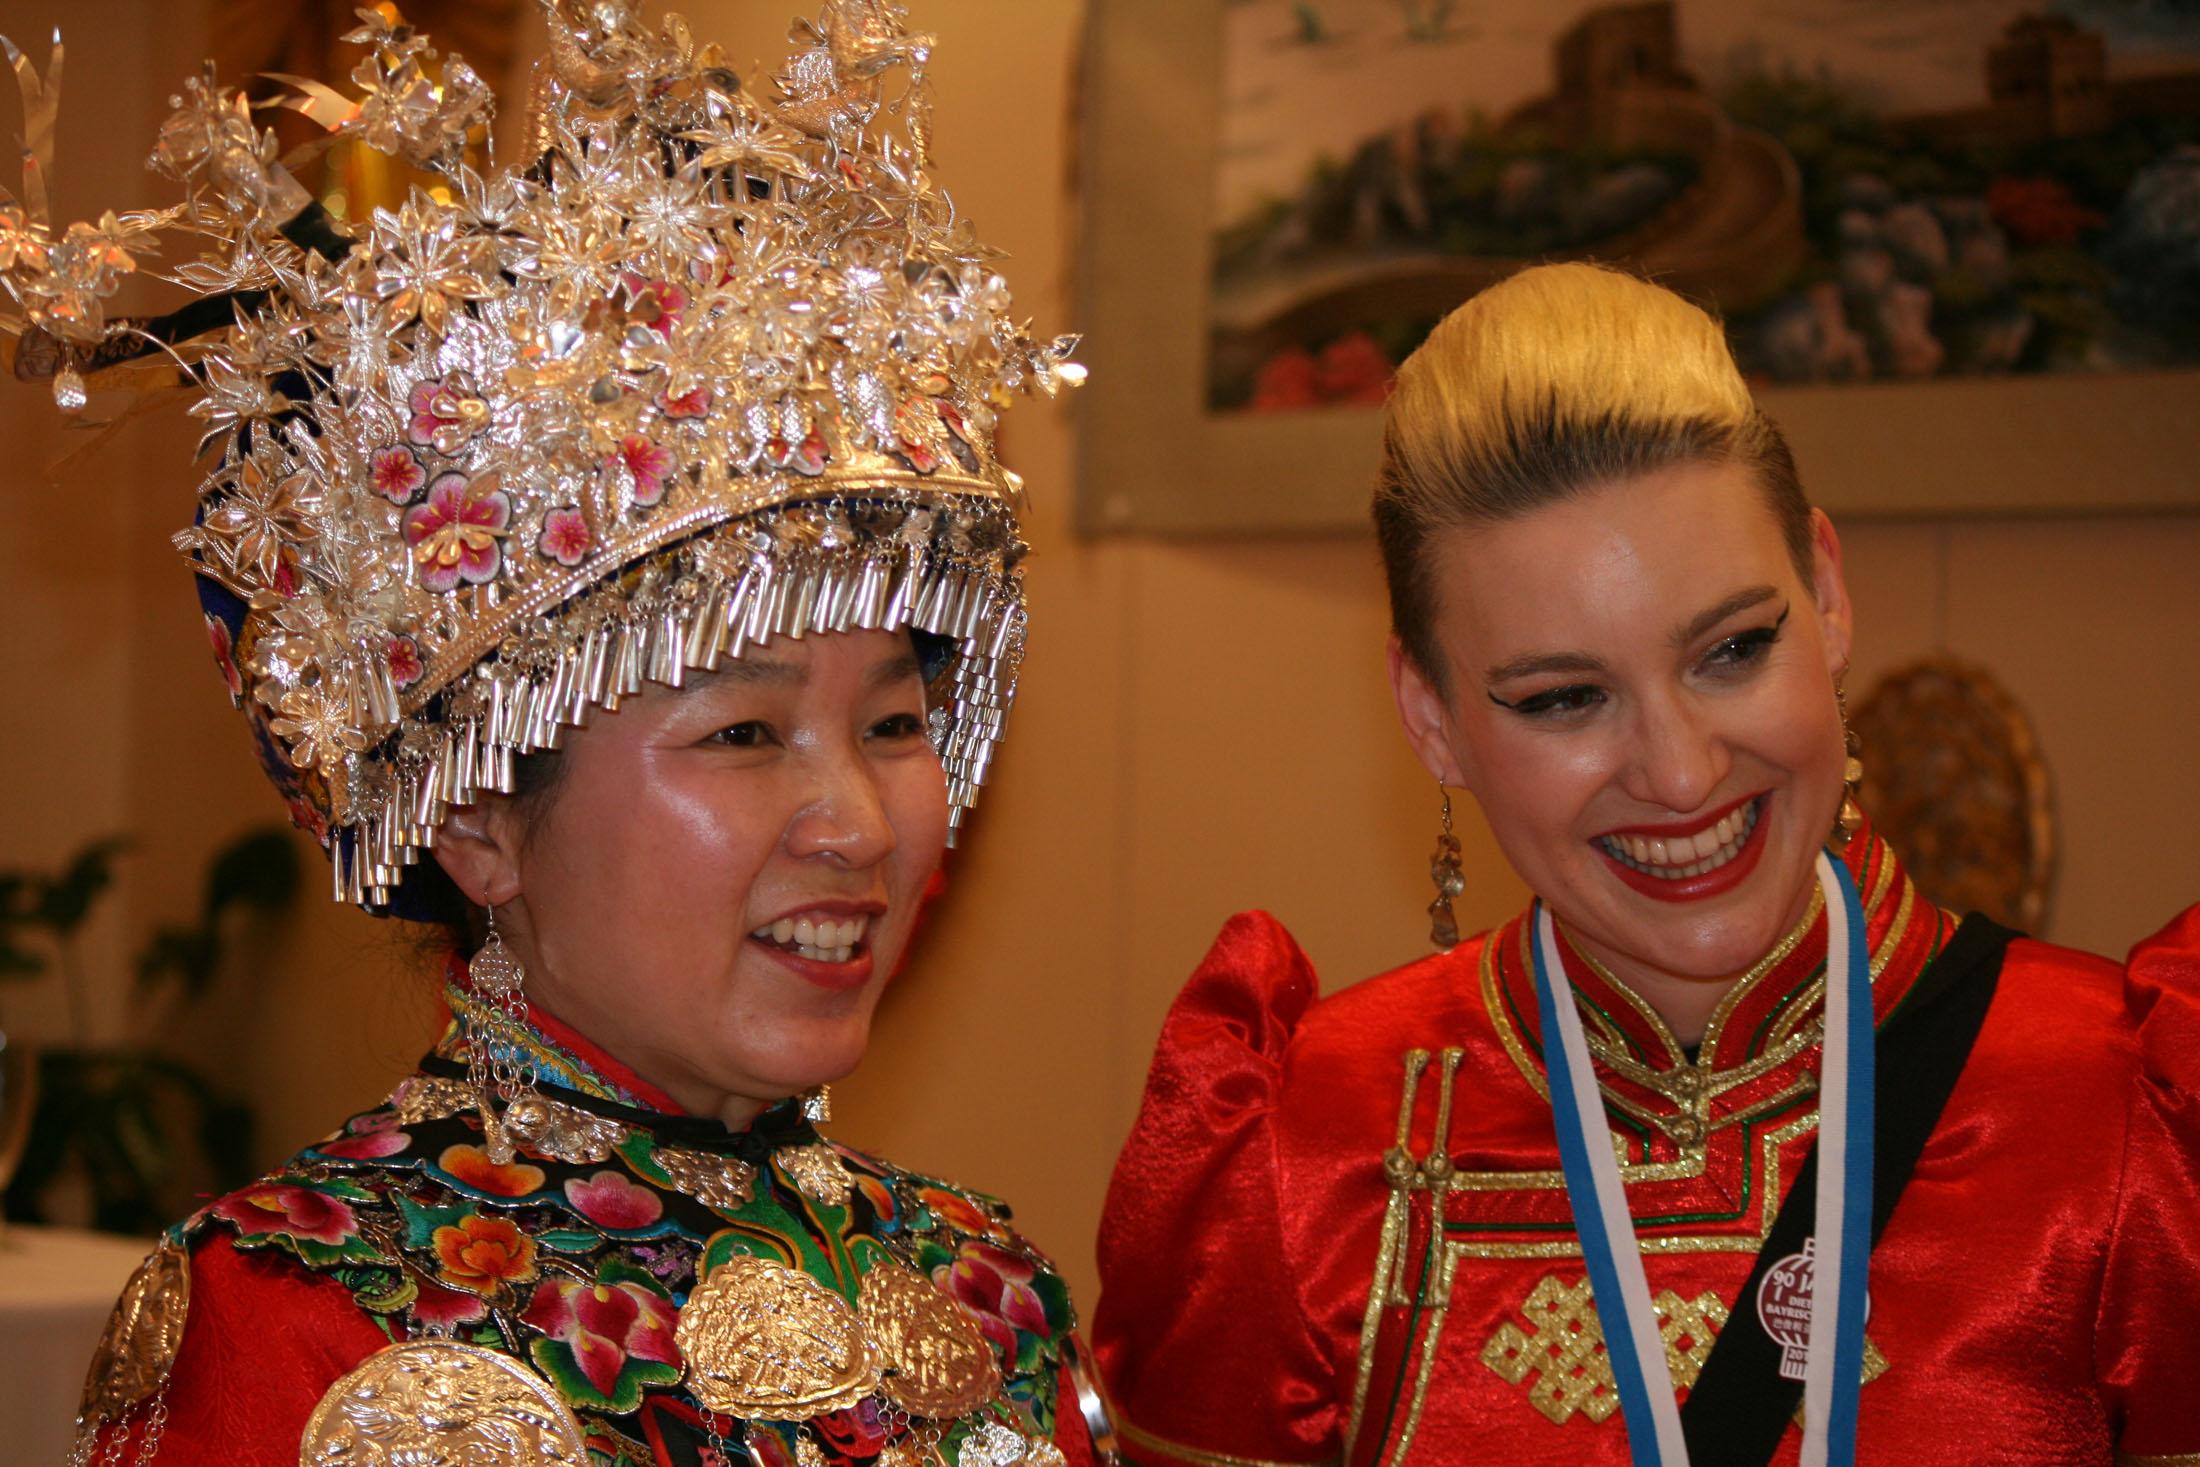 Chinese Carnival in Dietfurt - Dietfurter Chinesenfasching